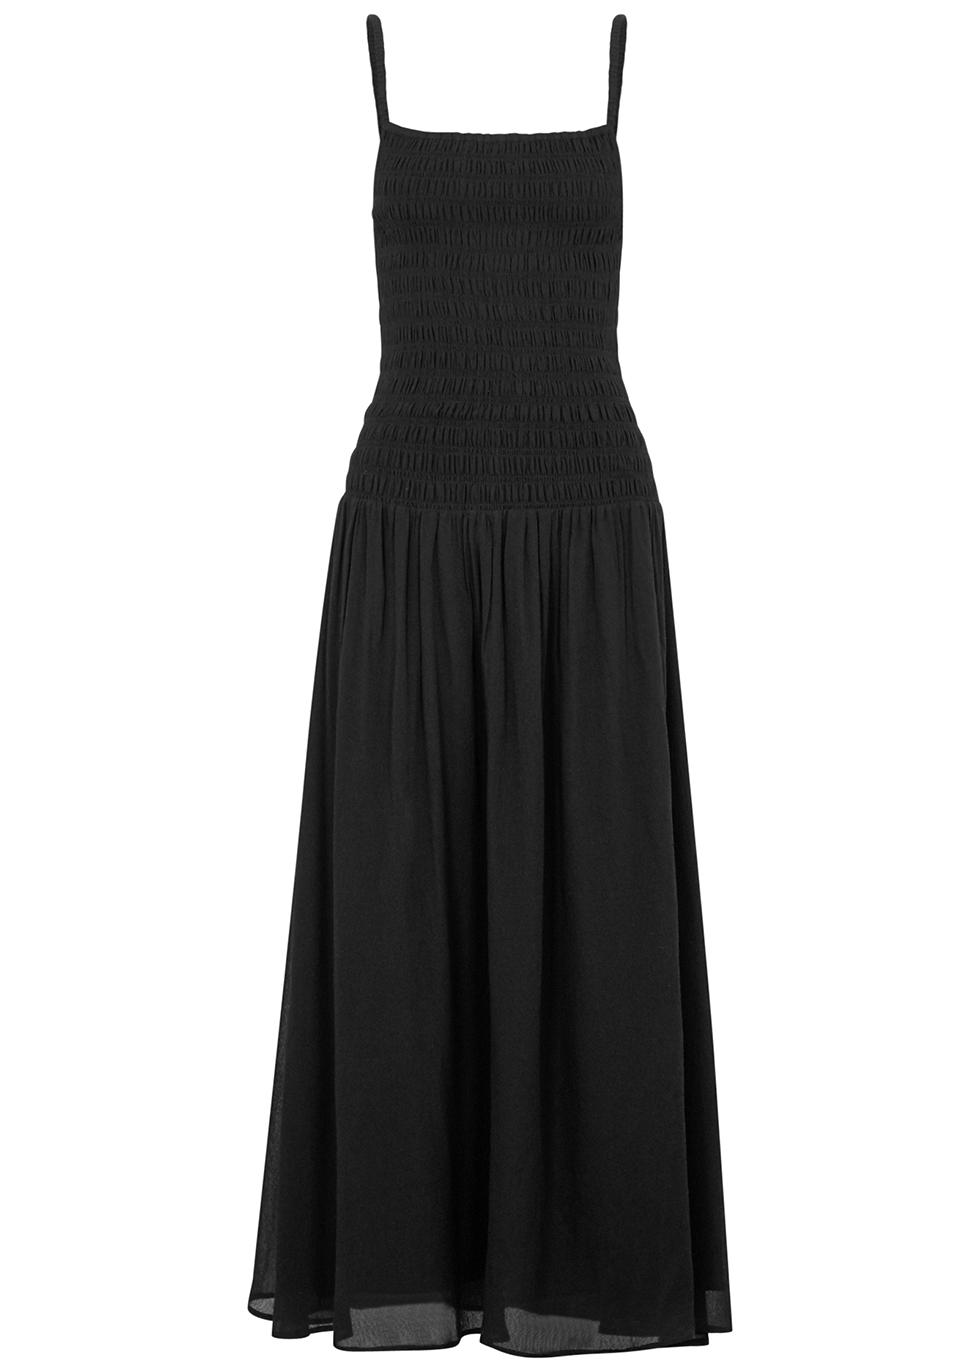 Black smocked midi dress